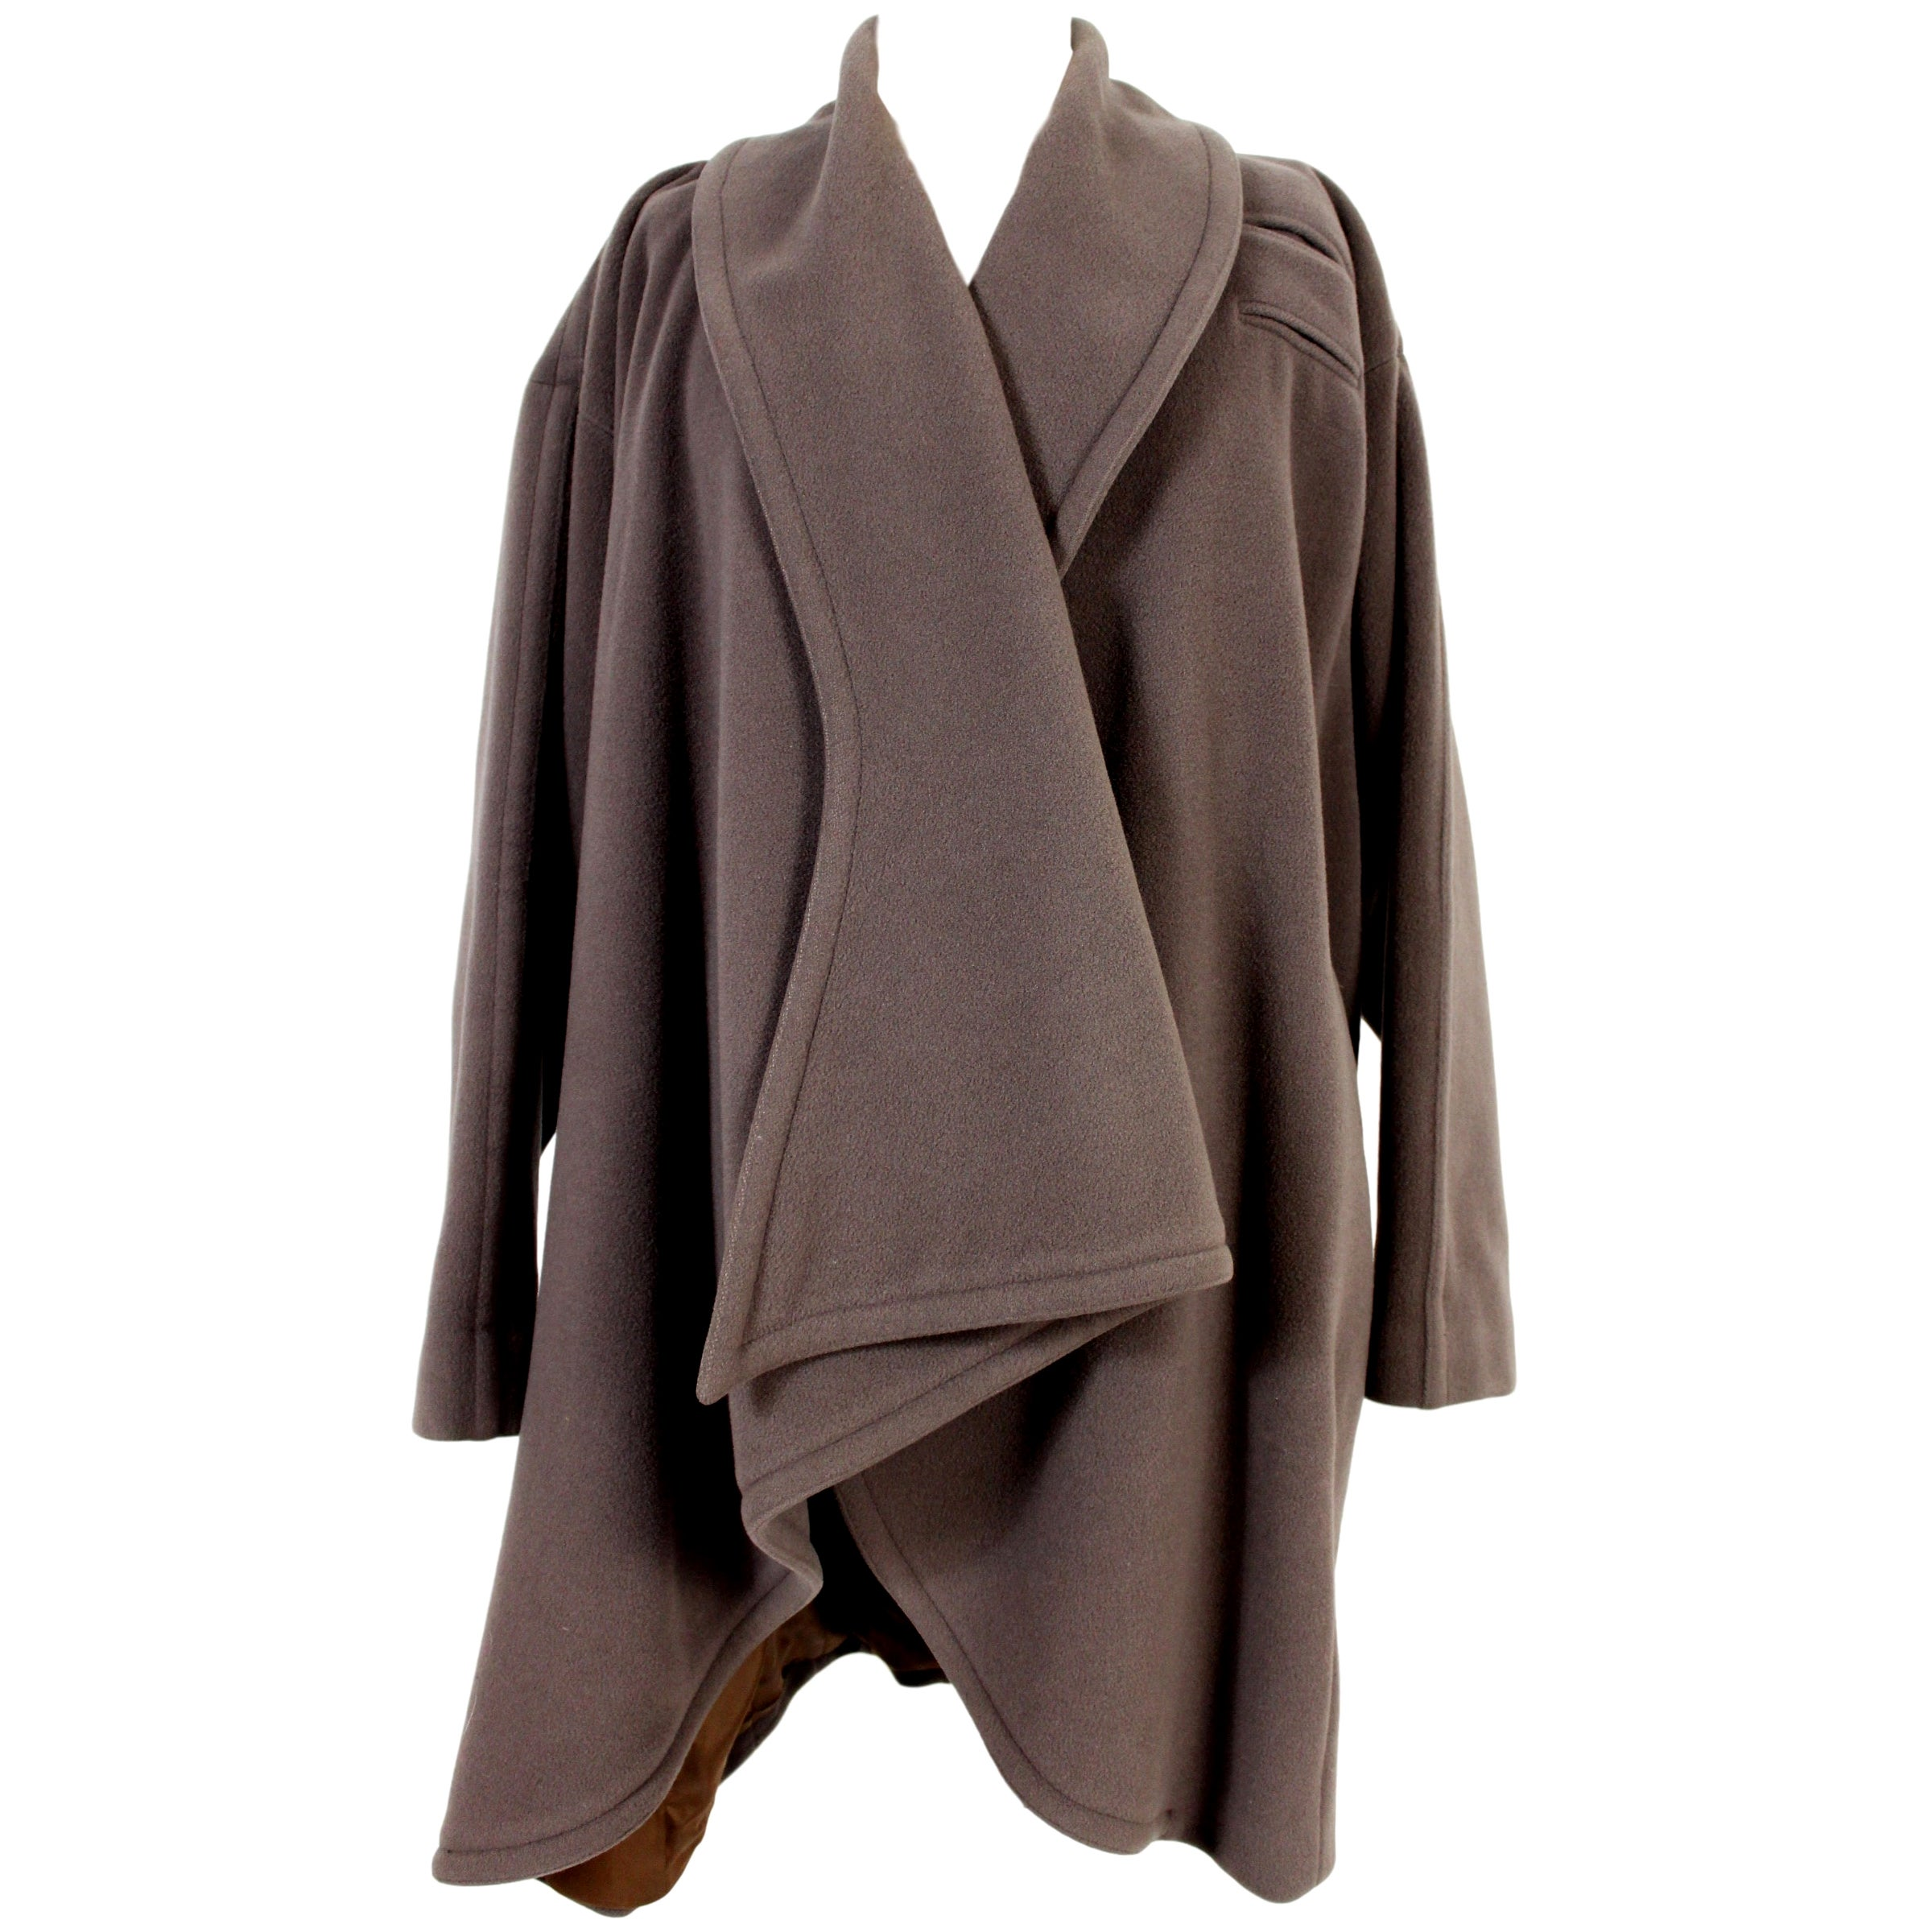 Enrico Coveri Brown Wool Long Hood Oversize Shawl Coat